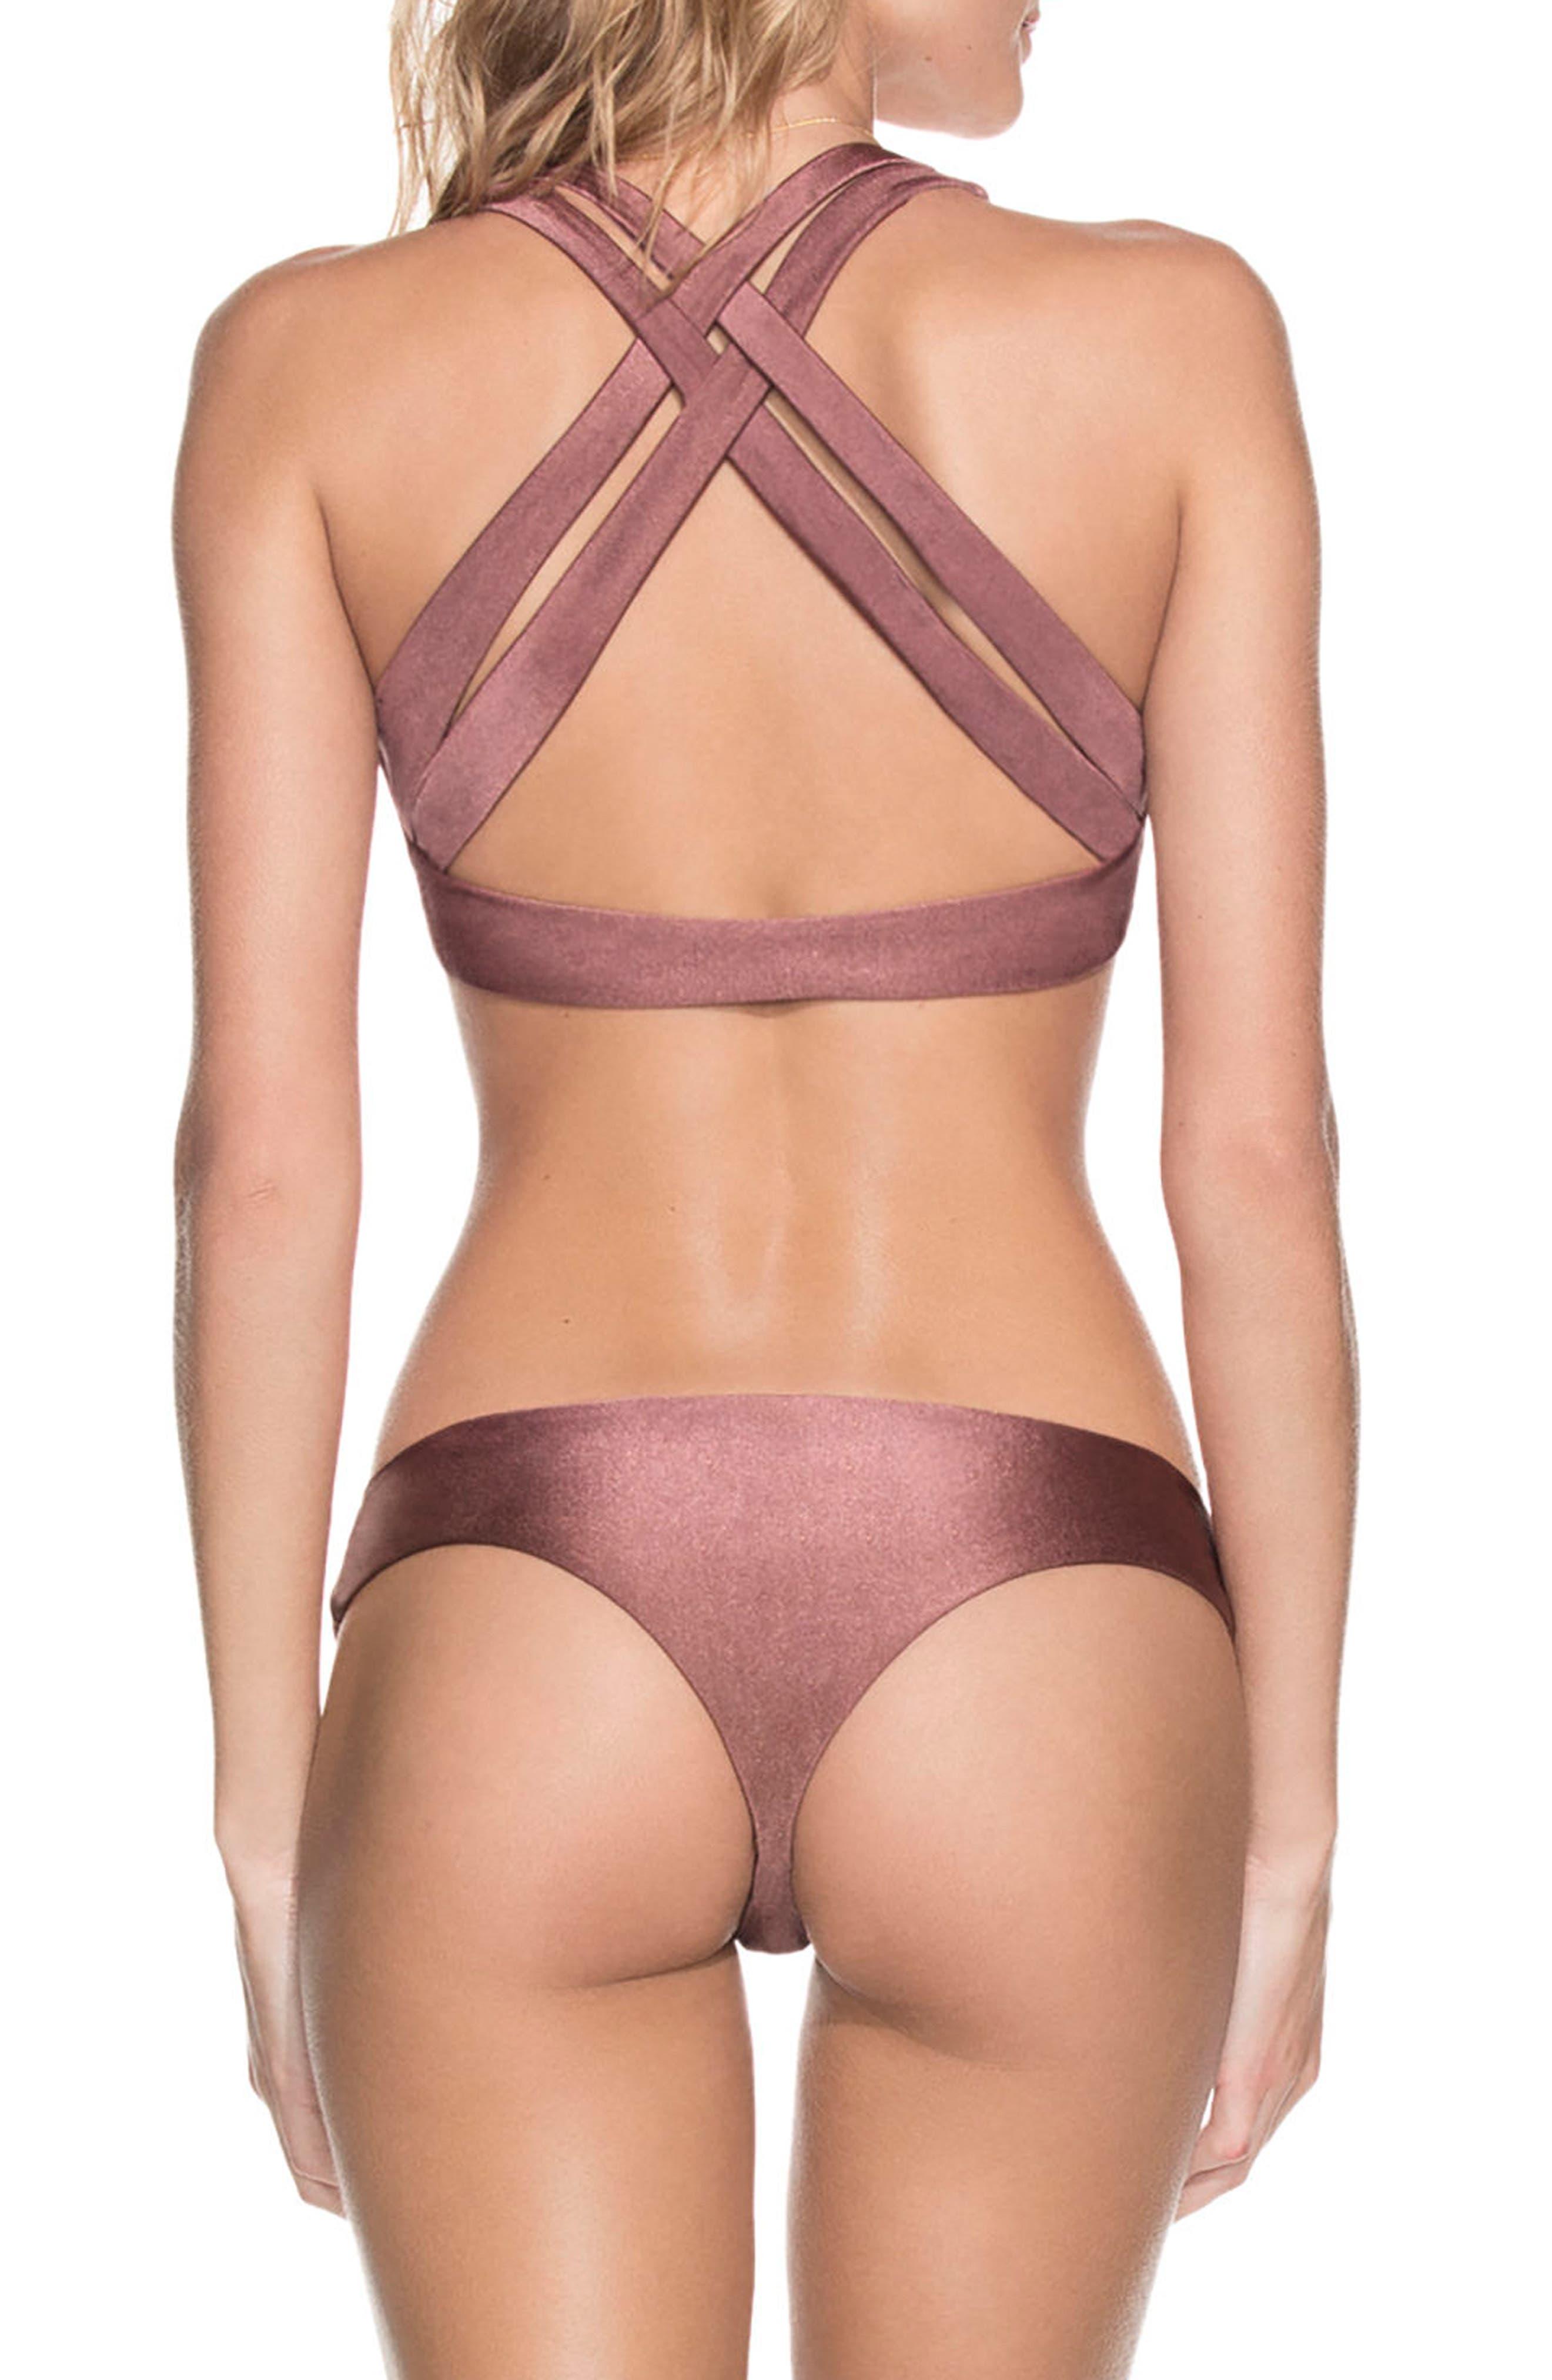 Shimmering Cognac Reversible Bikini Top,                             Alternate thumbnail 7, color,                             Cognac